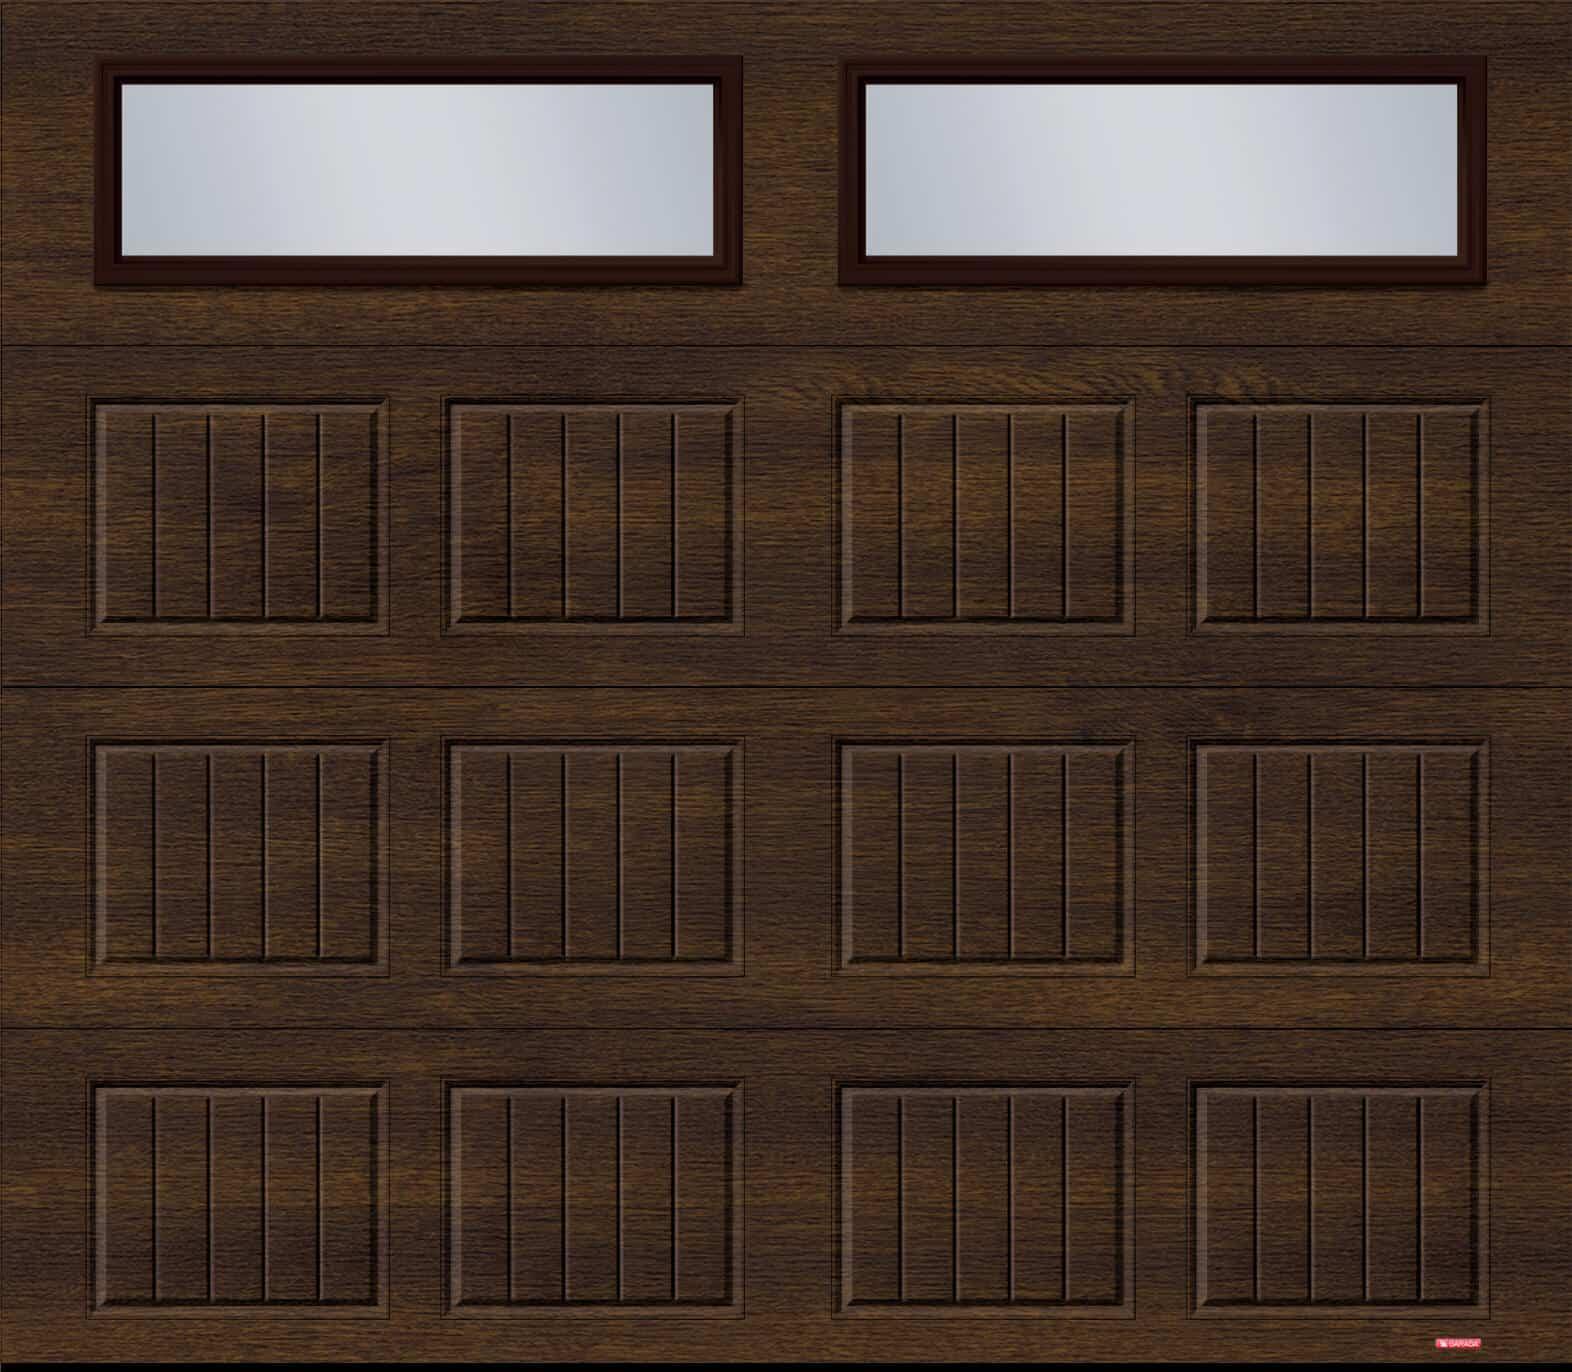 Standard+ North Hatley SP, 8' x 7', Chocolate Walnut, Clear windows